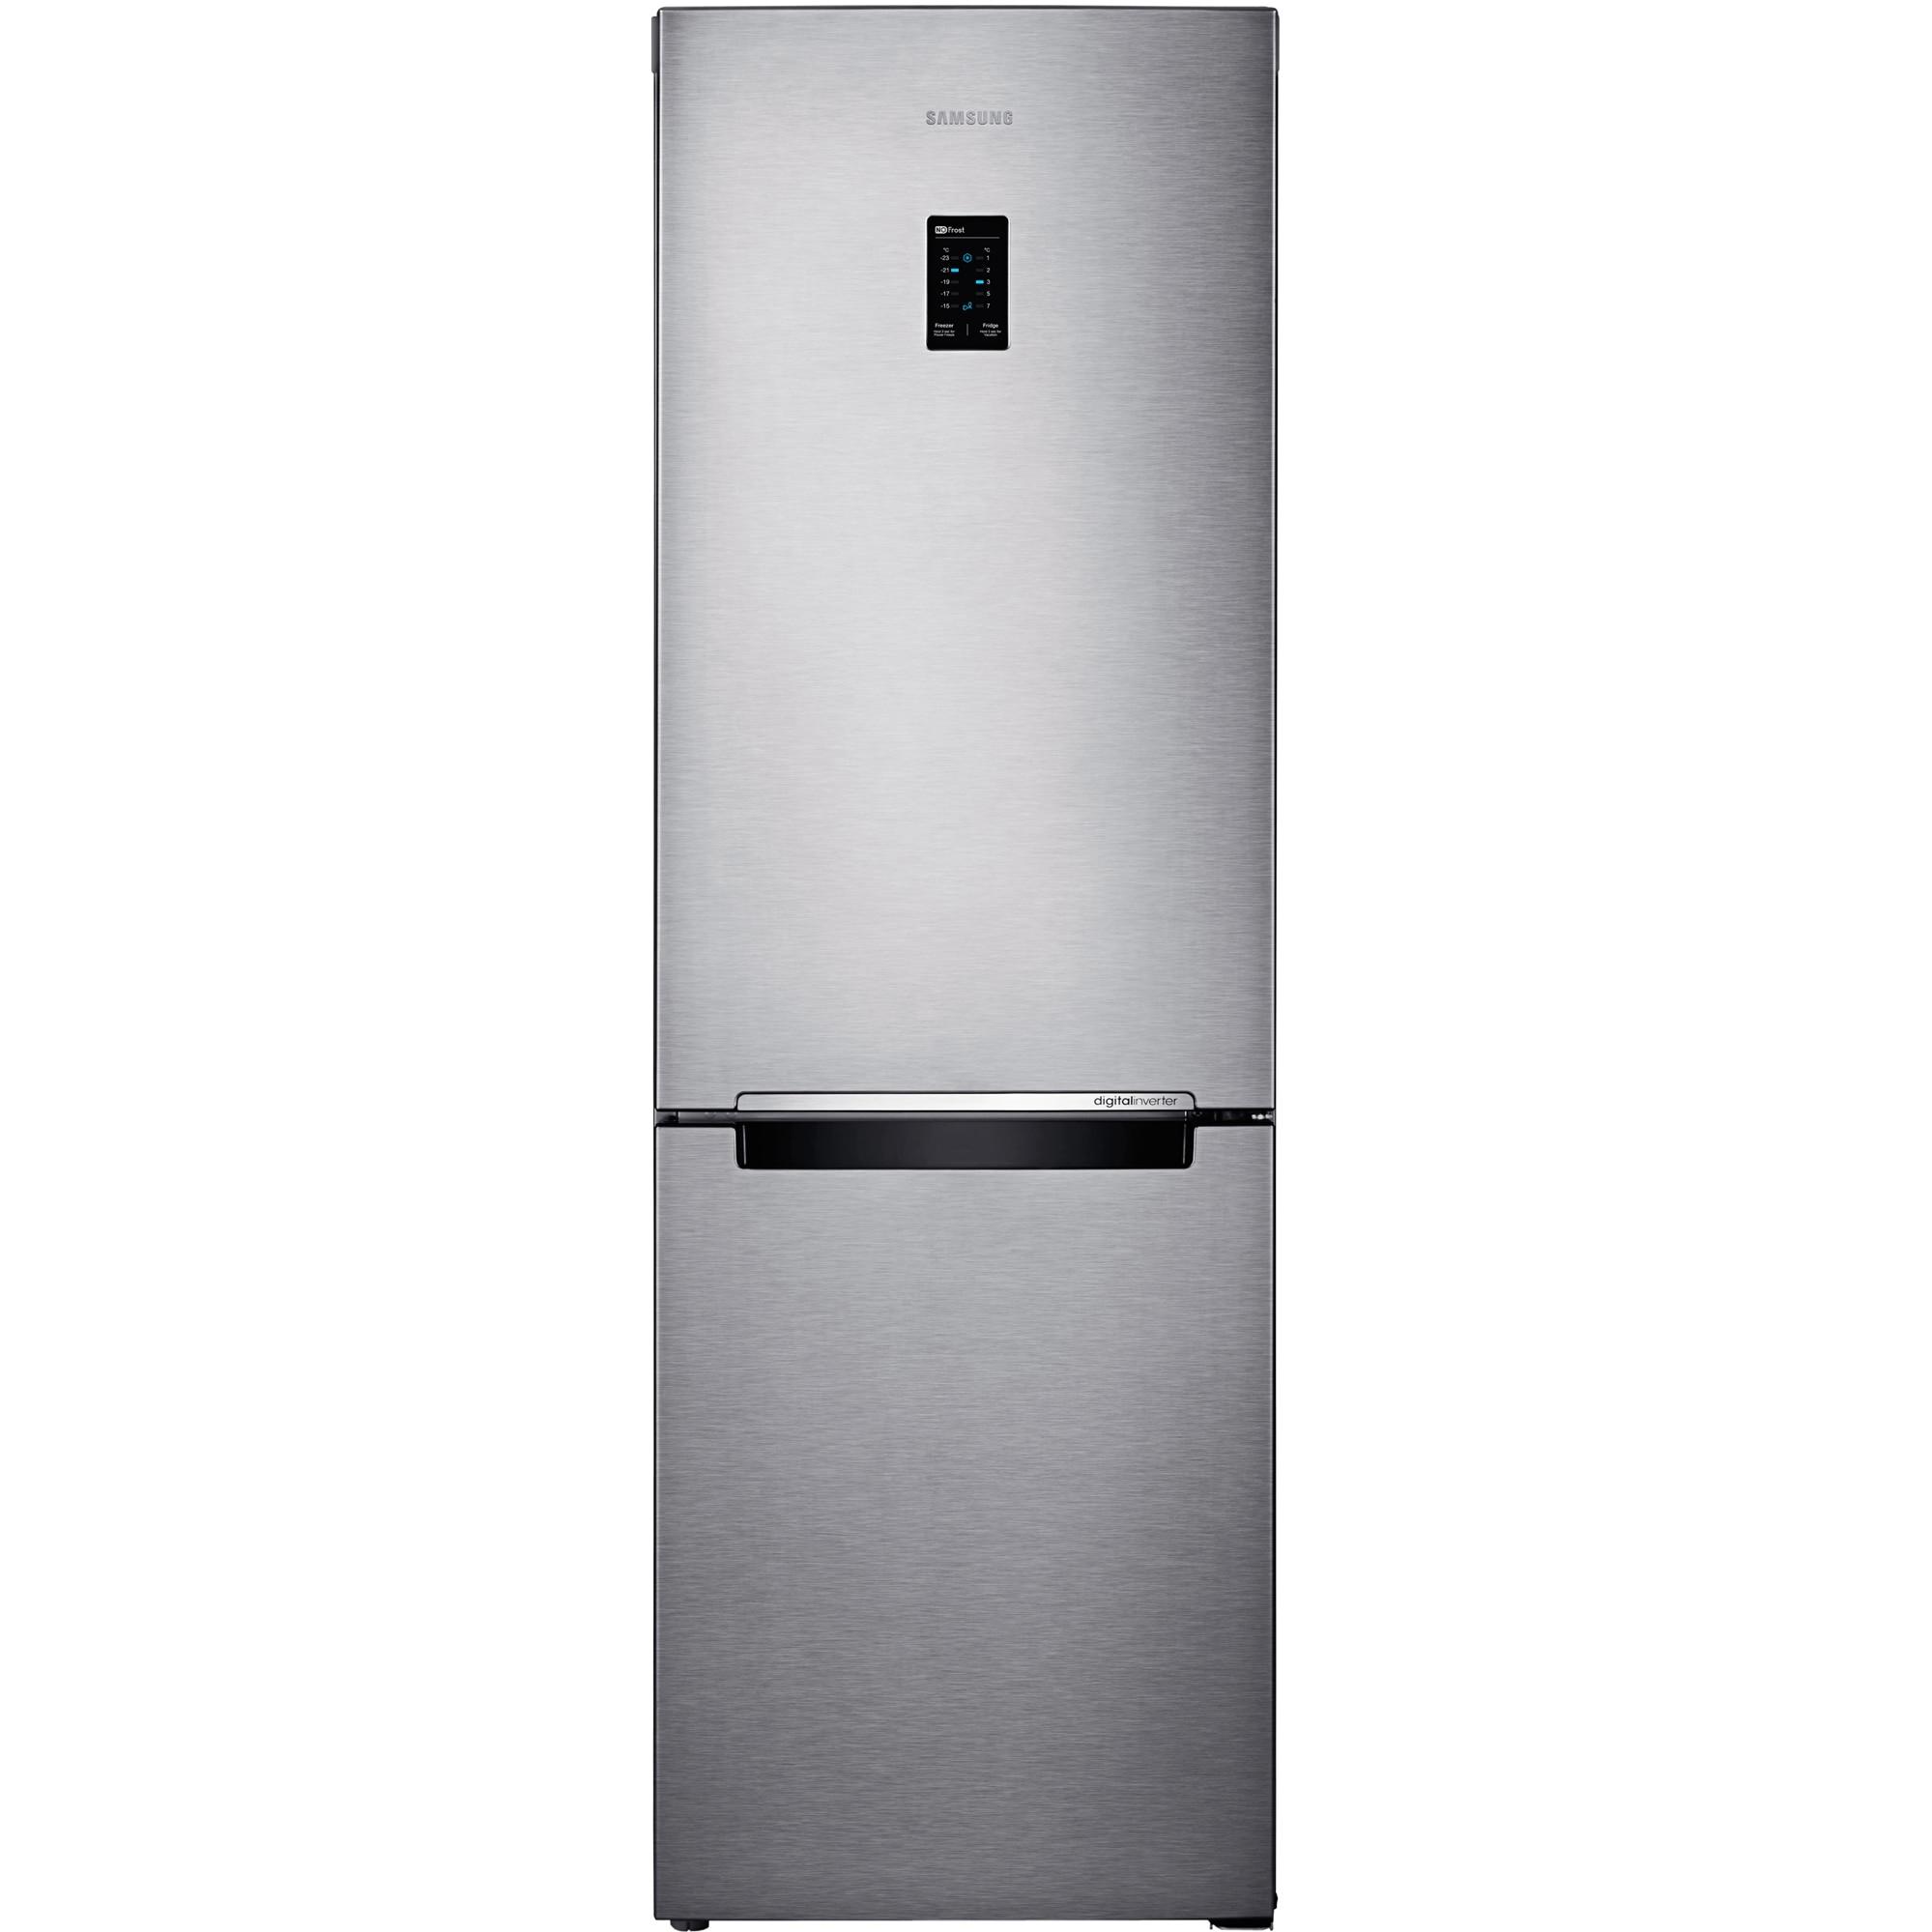 Fotografie Combina frigorifica Samsung RB31FERNDSA, 310 l, Clasa F, No Frost, Compresor Digital Inverter, H 185 cm, Argintiu